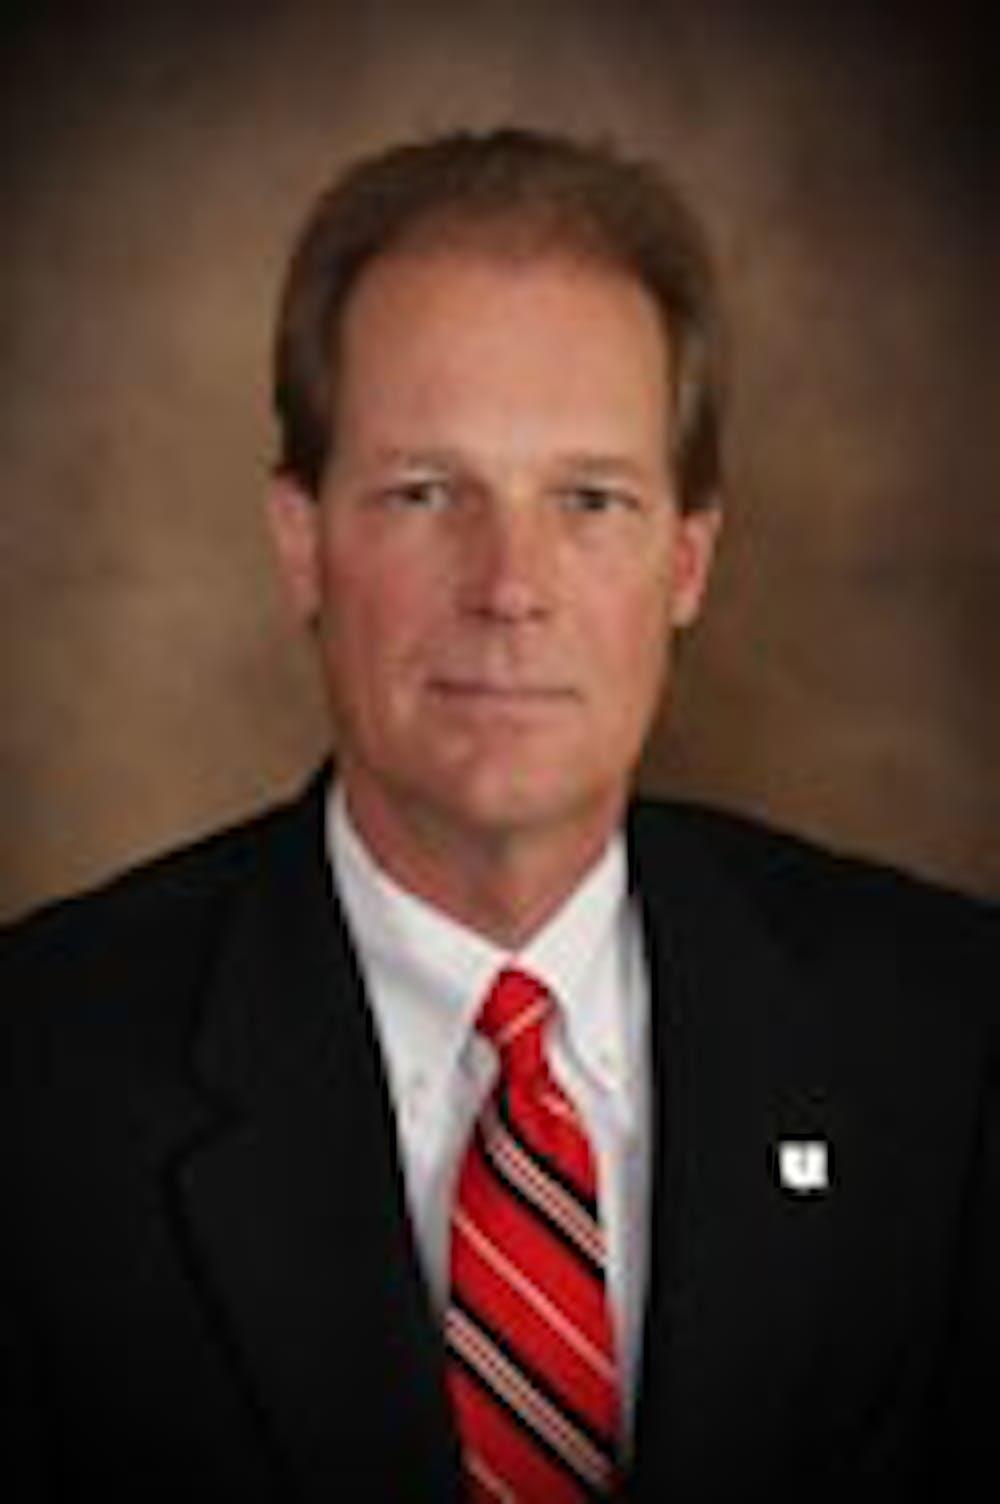 Bryan Benchoff to leave Ohio University Foundation